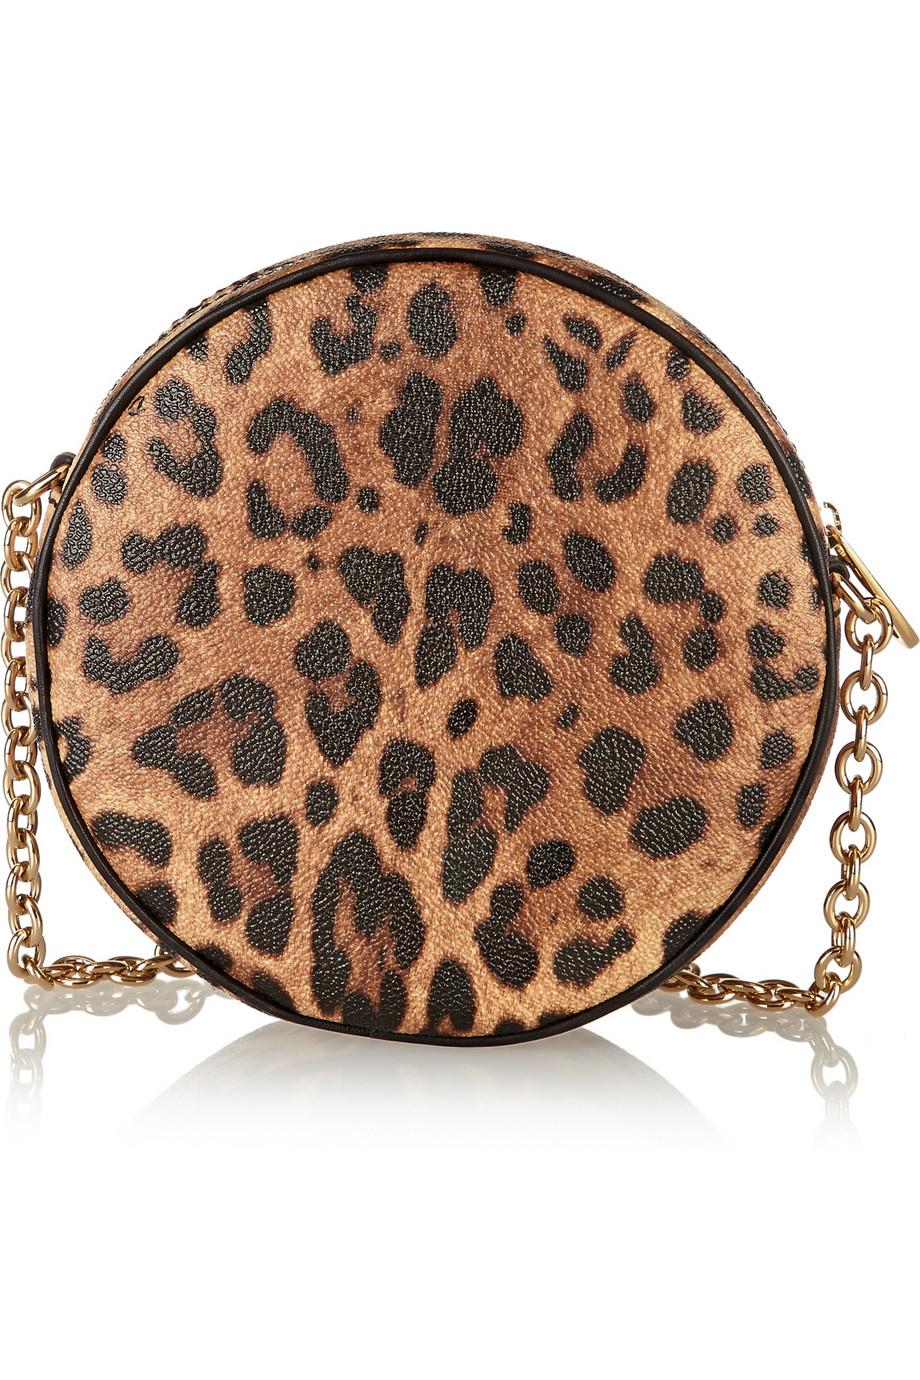 Italian Gold Chain >> Dolce & gabbana Glam Leopard-Print Faux Leather Shoulder ...